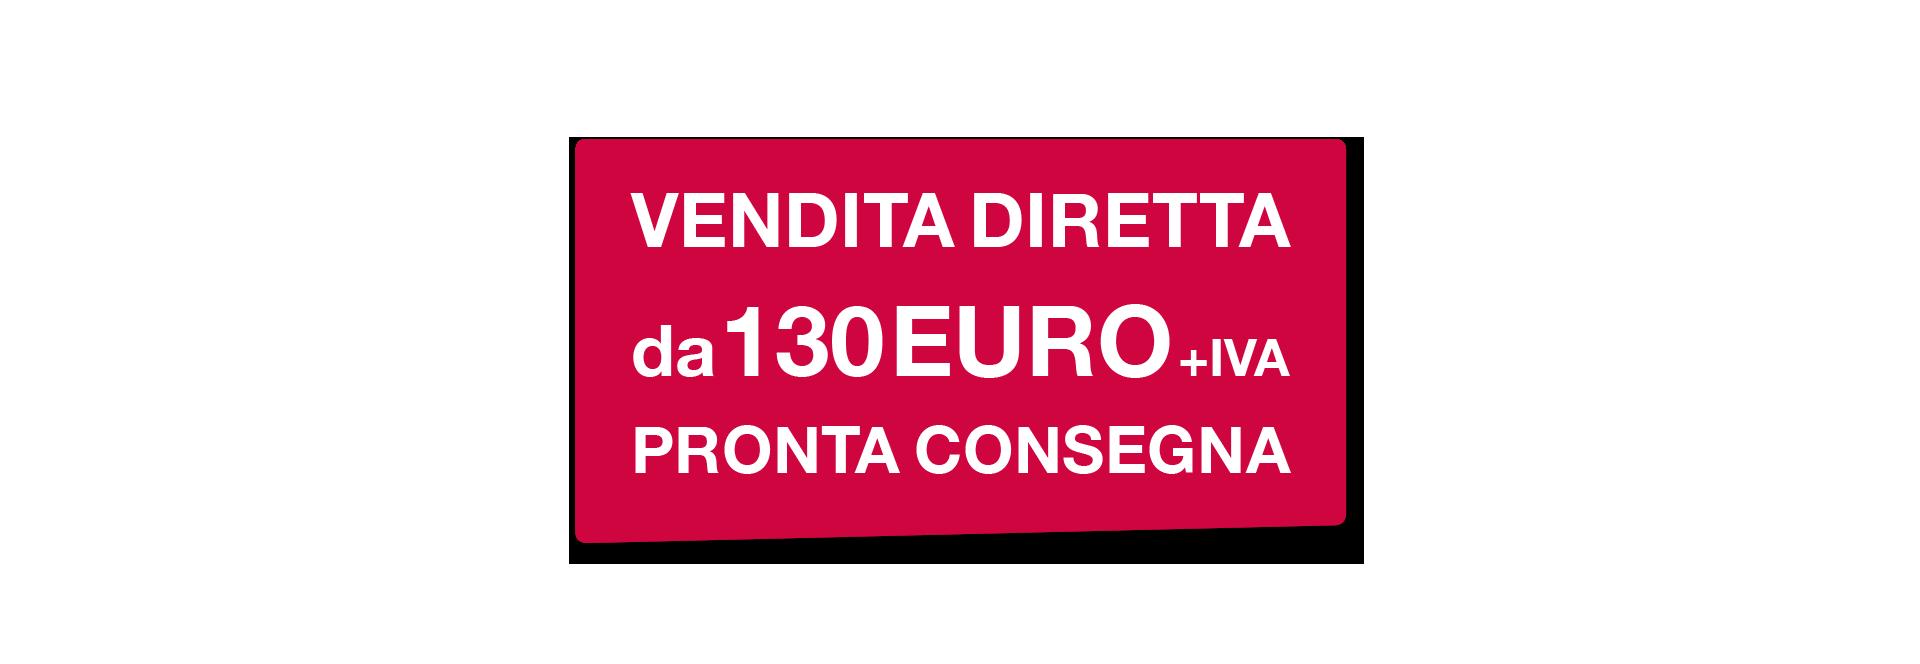 CM-PORTE-banner-vendita-porte-2